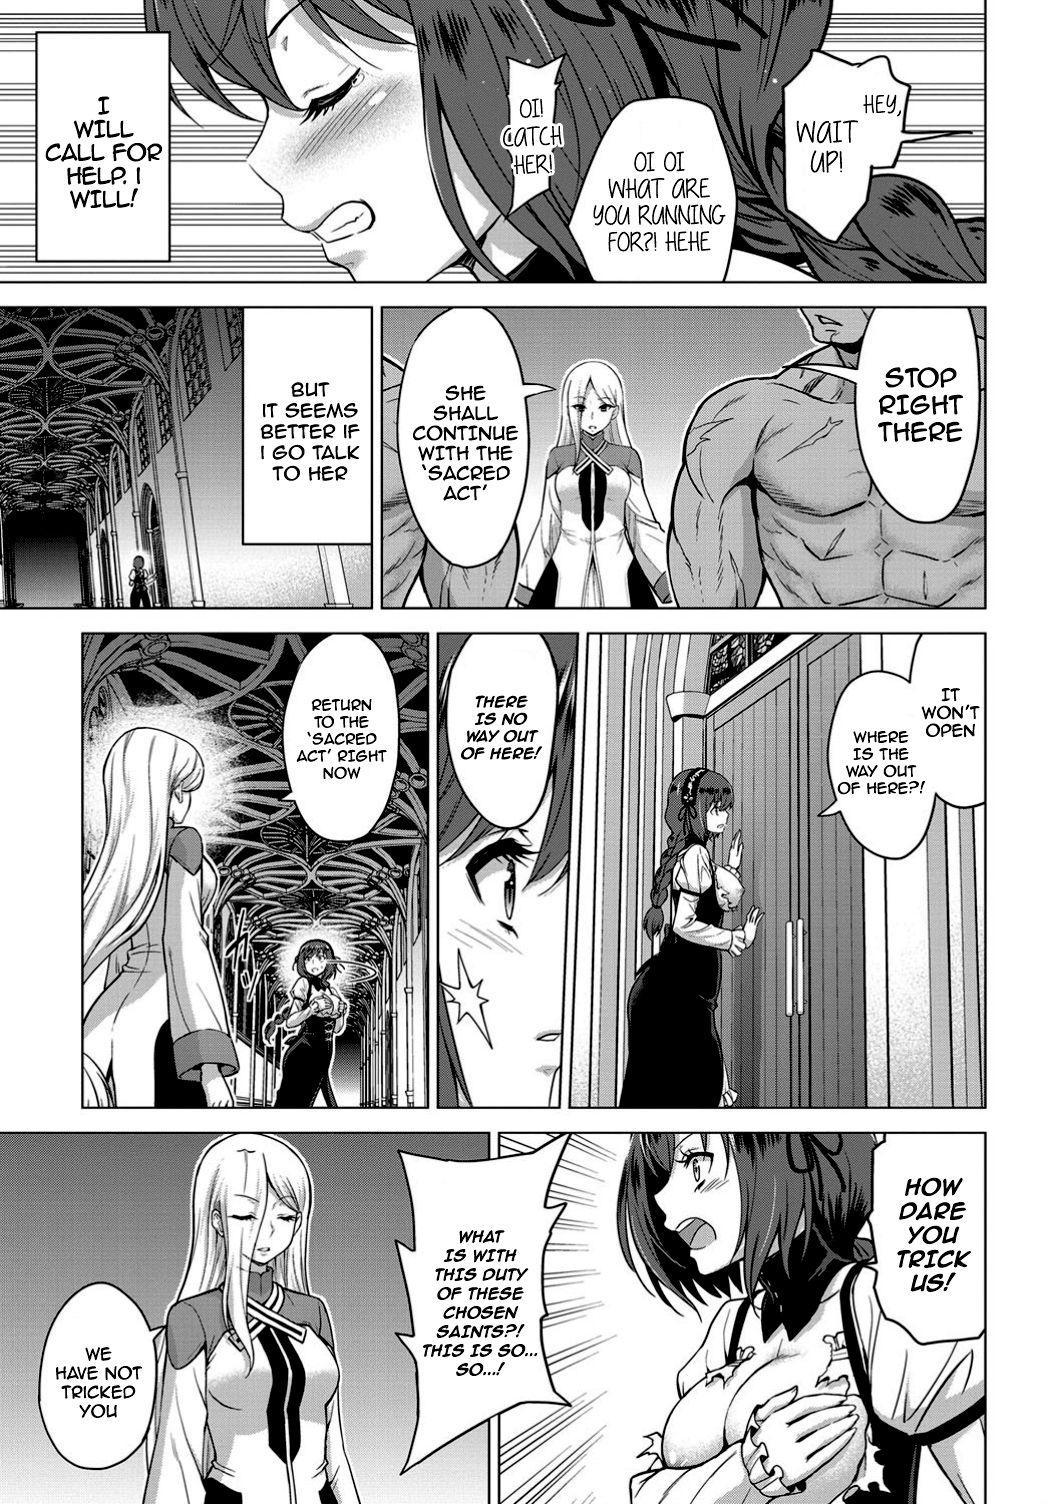 [Yamada Gogogo] Seijo no Rakuin -Annunciation of despair- #01 (COMIC BAVEL 2019-11) [English] {Stopittarpit} [Digital] 19